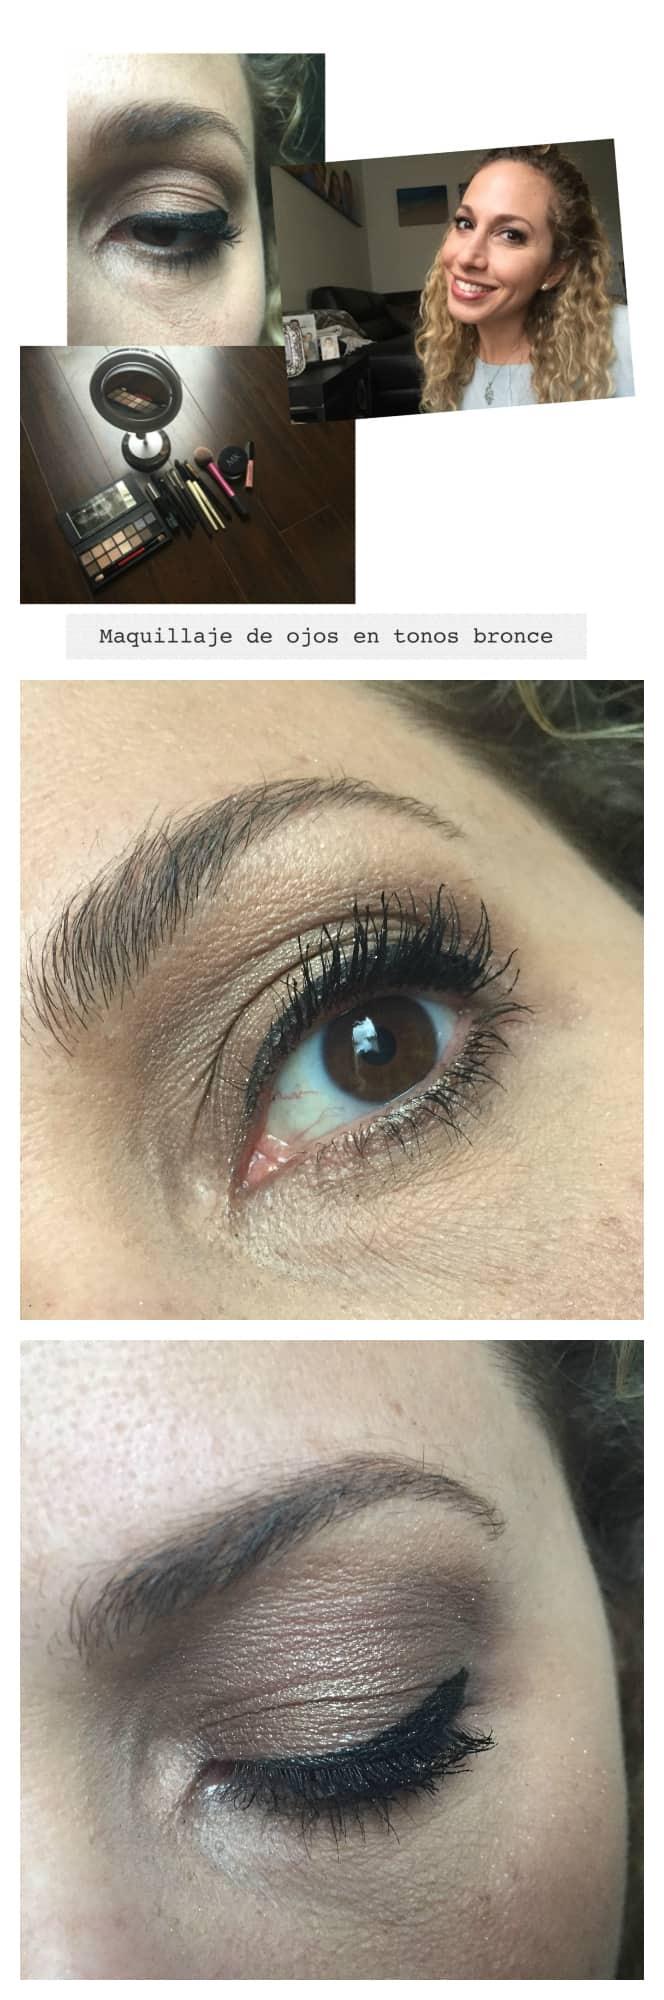 Maquillaje de ojos en tonos bronce paso a paso